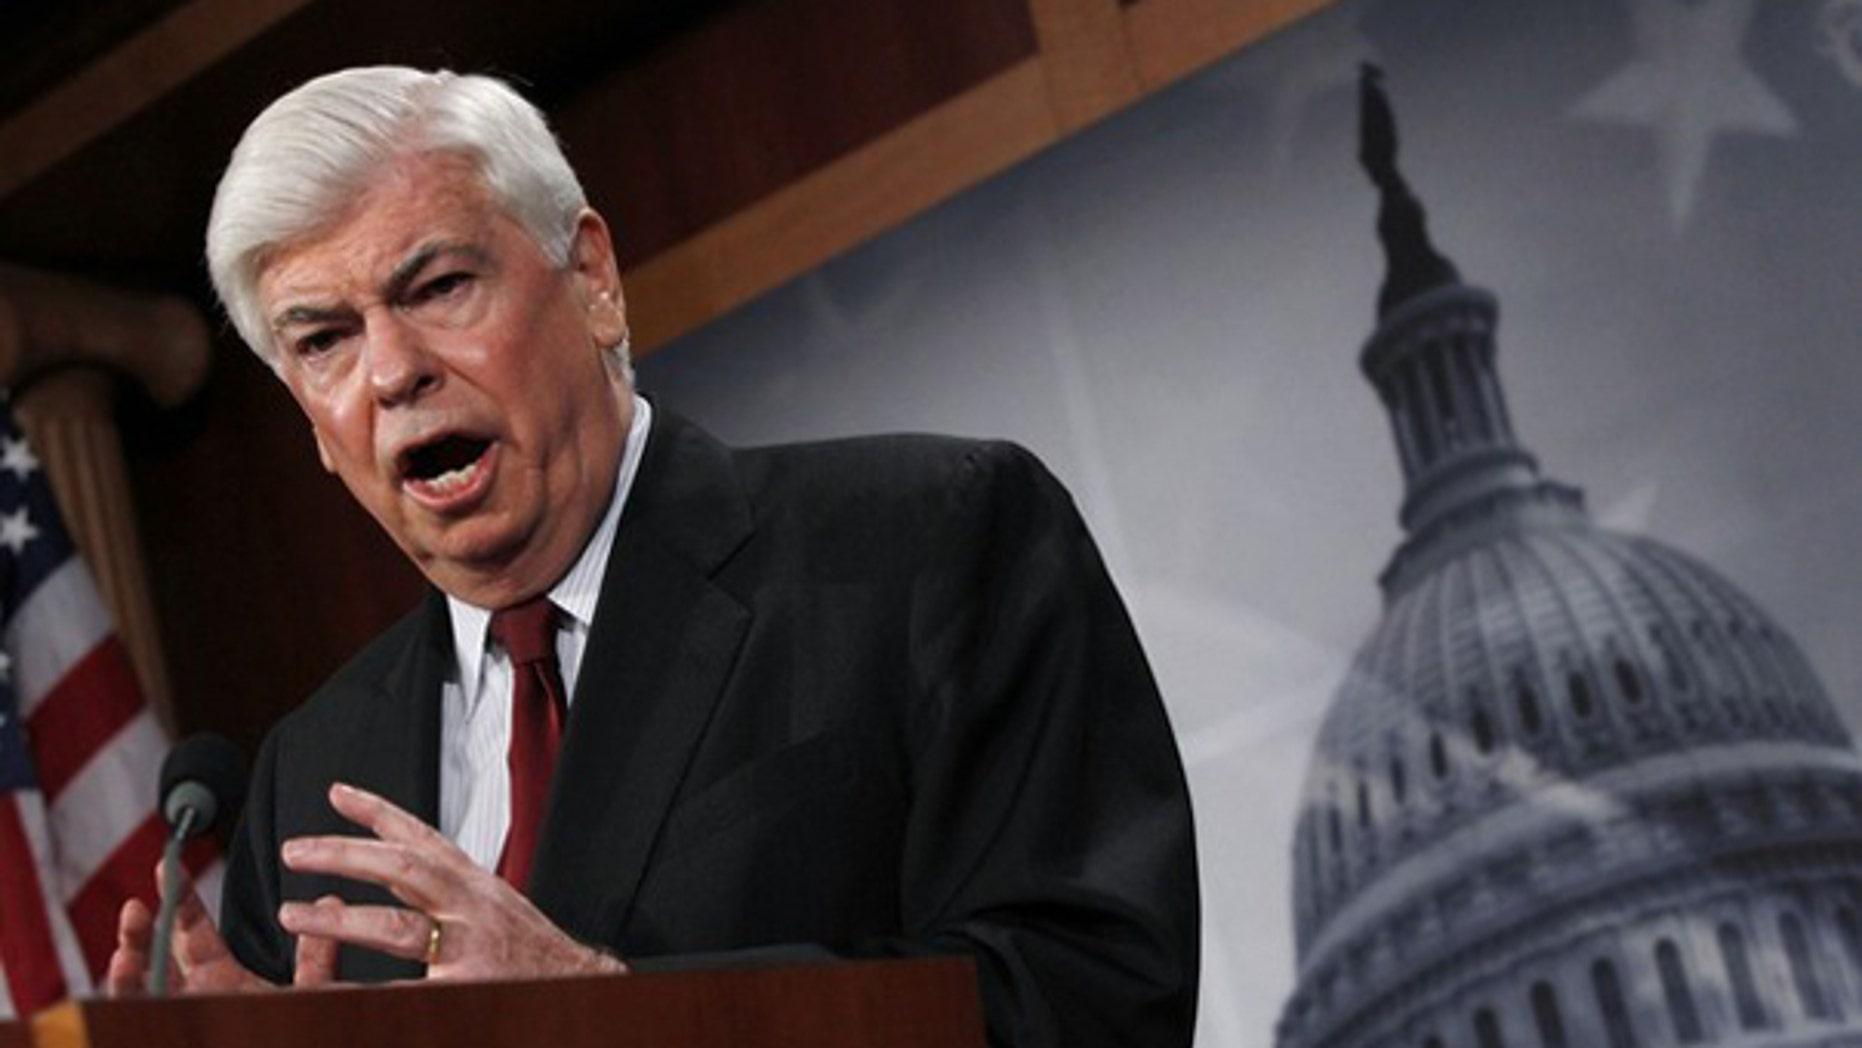 Sen. Chris Dodd unveils his financial reform bill on Capitol Hill March 15. (Reuters Photo)